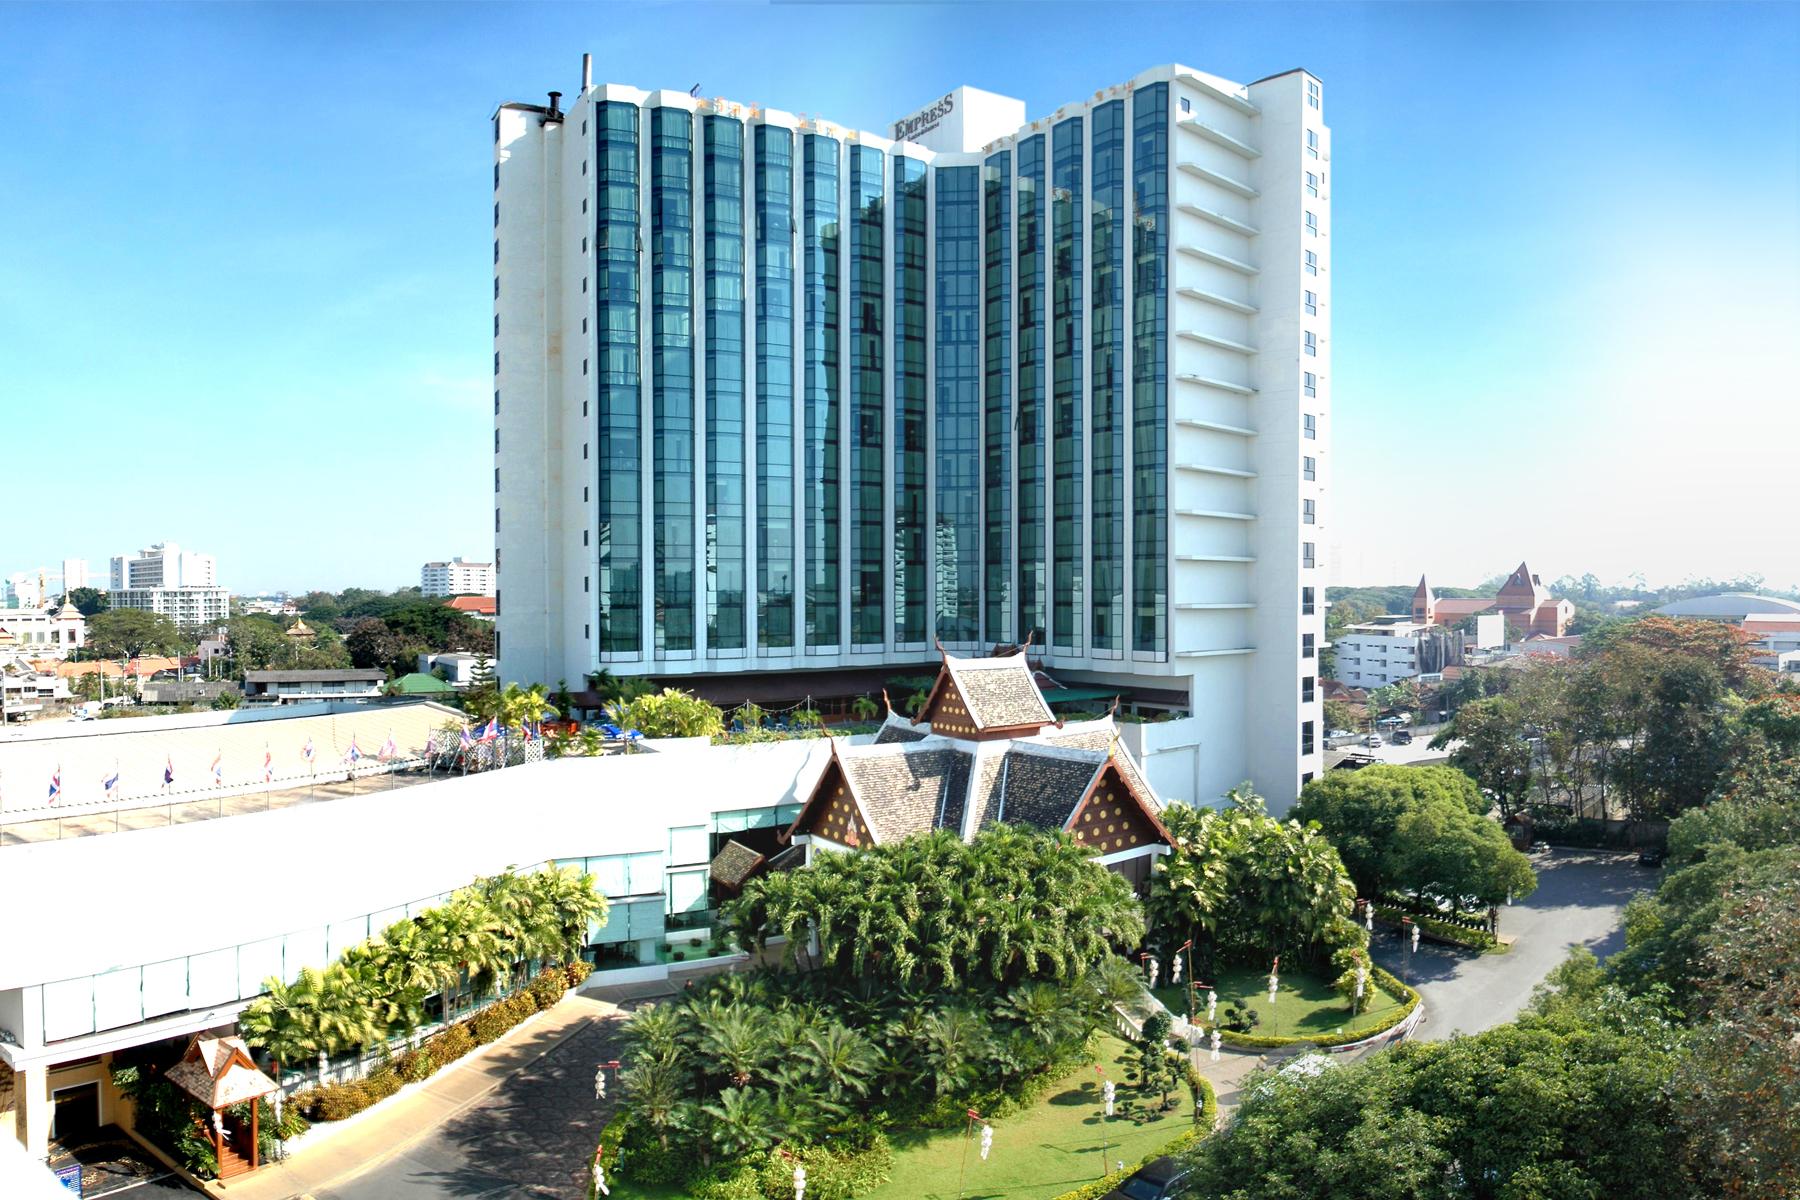 lanna massage billige hoteller i århus centrum